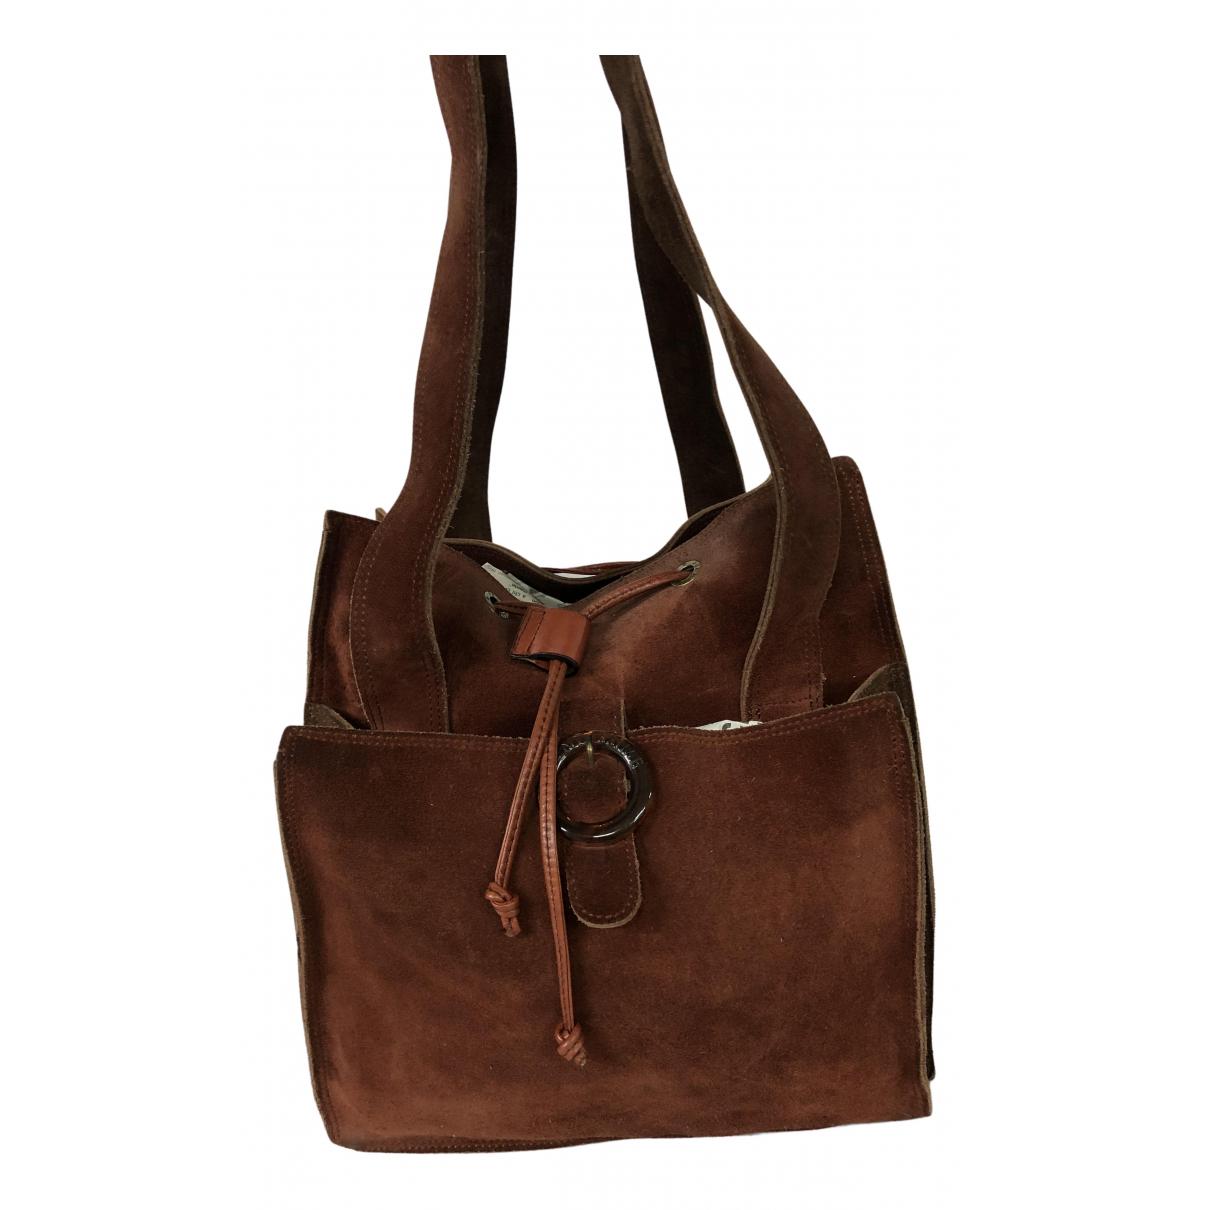 Fendissime \N Handtasche in  Braun Veloursleder